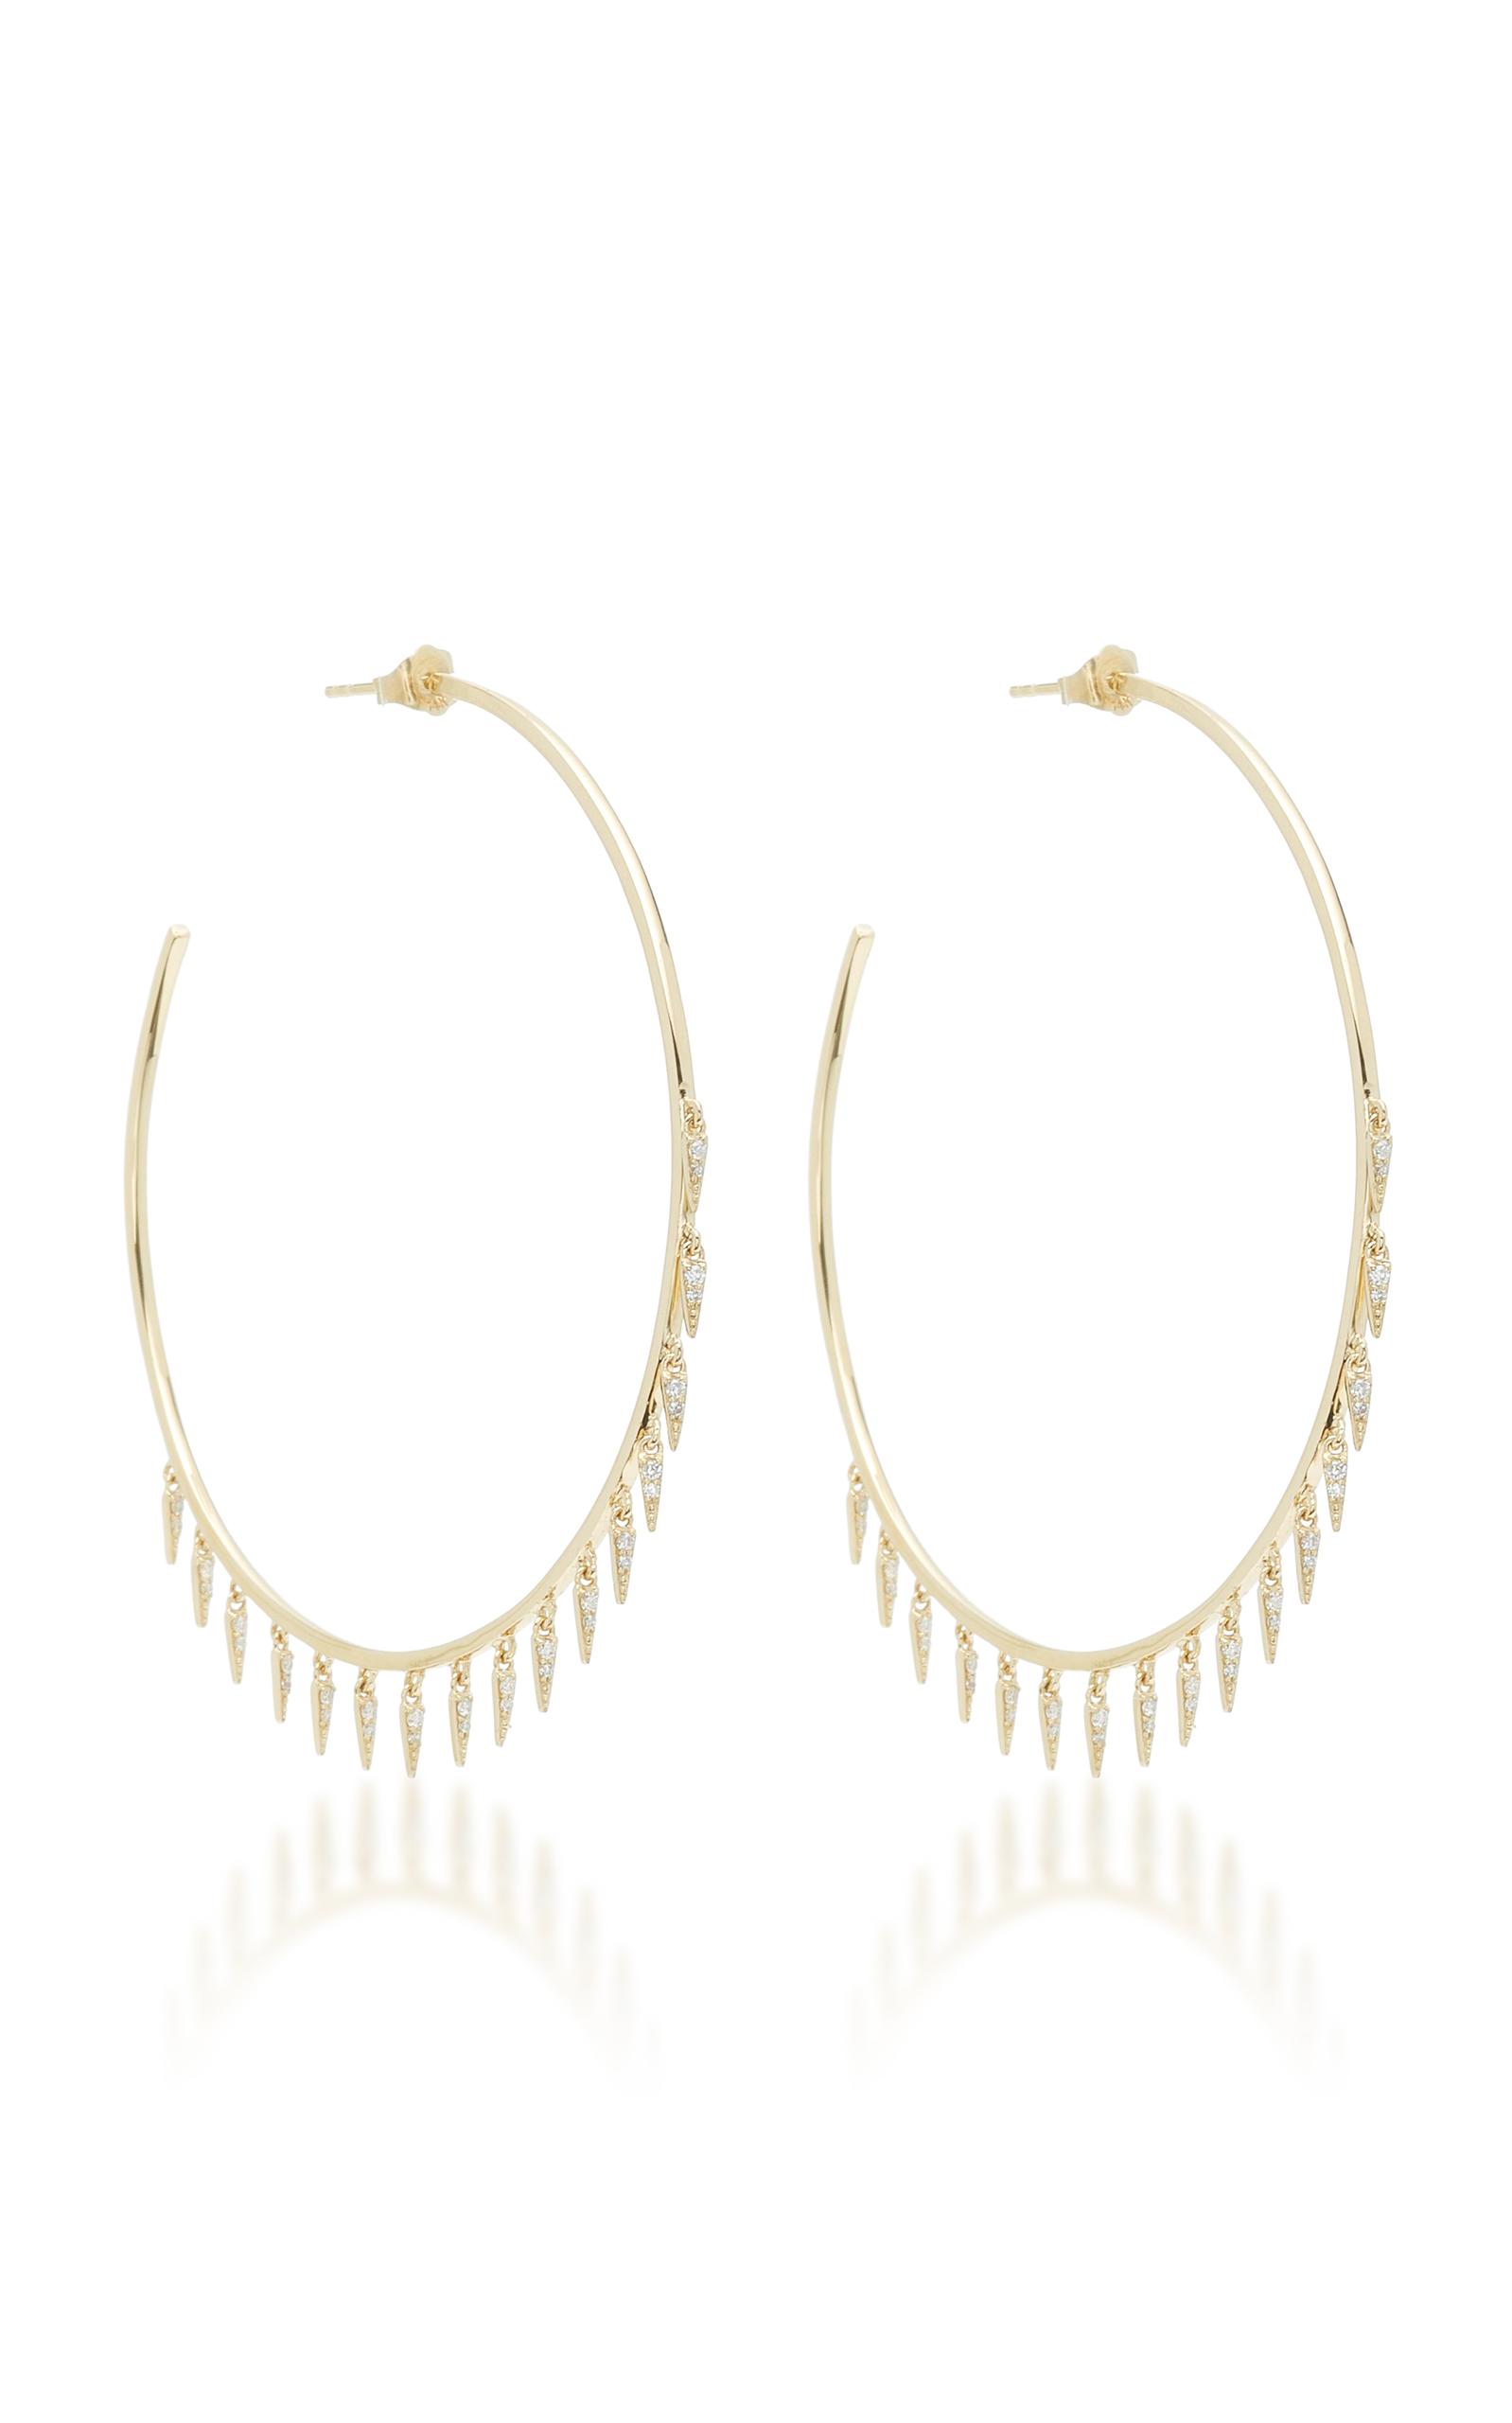 Sydney Evan Medium Fringe Drop Earrings giqYSKy6Xp